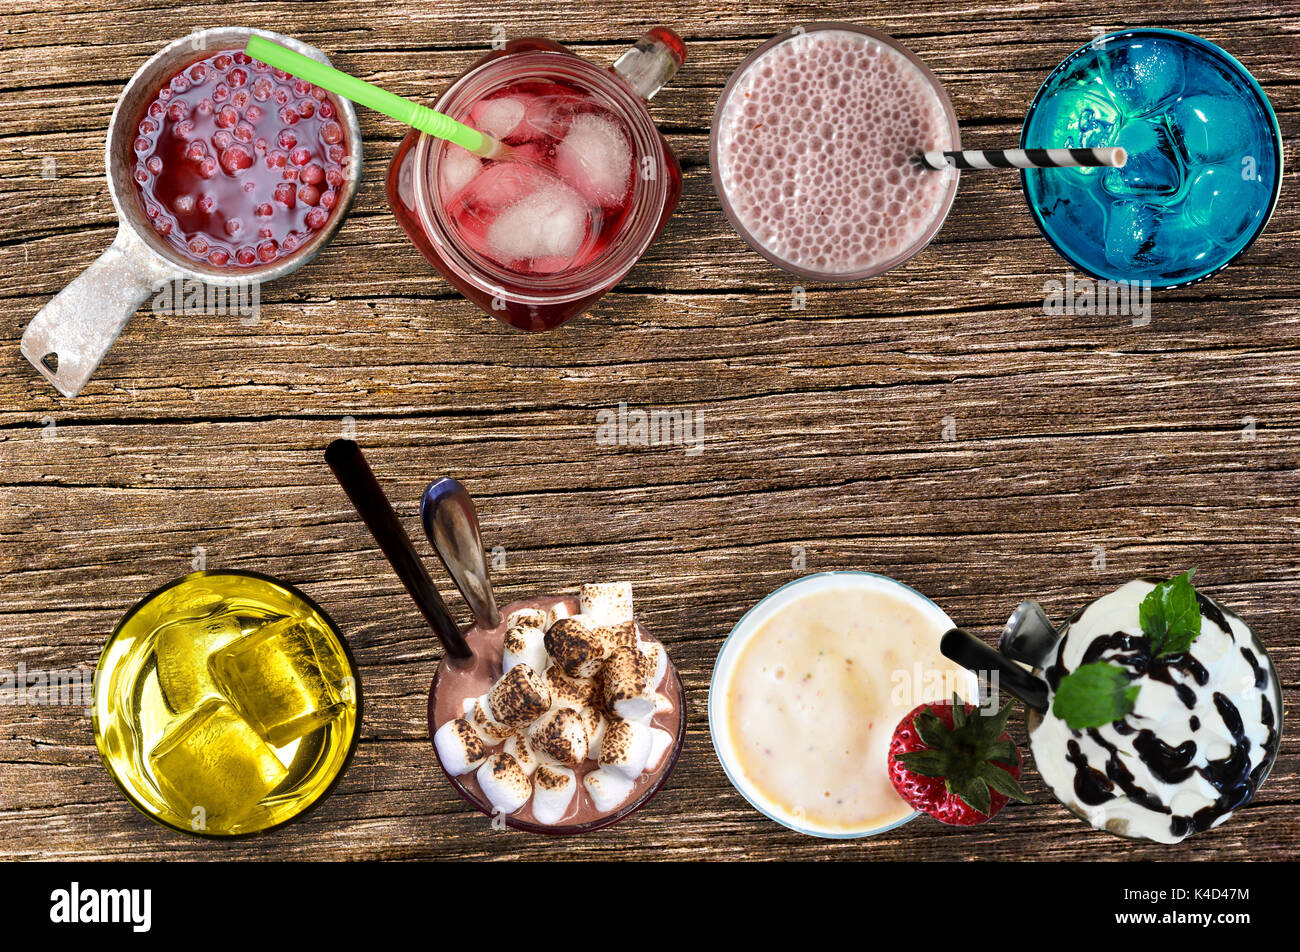 Summer drinks. Lingonberry Drink; İced cherry juice; Blue curaçao; Chocolate Milkshakes; Cocktail Friday; Ice blended chocolate drink; Iced tea; Straw - Stock Image